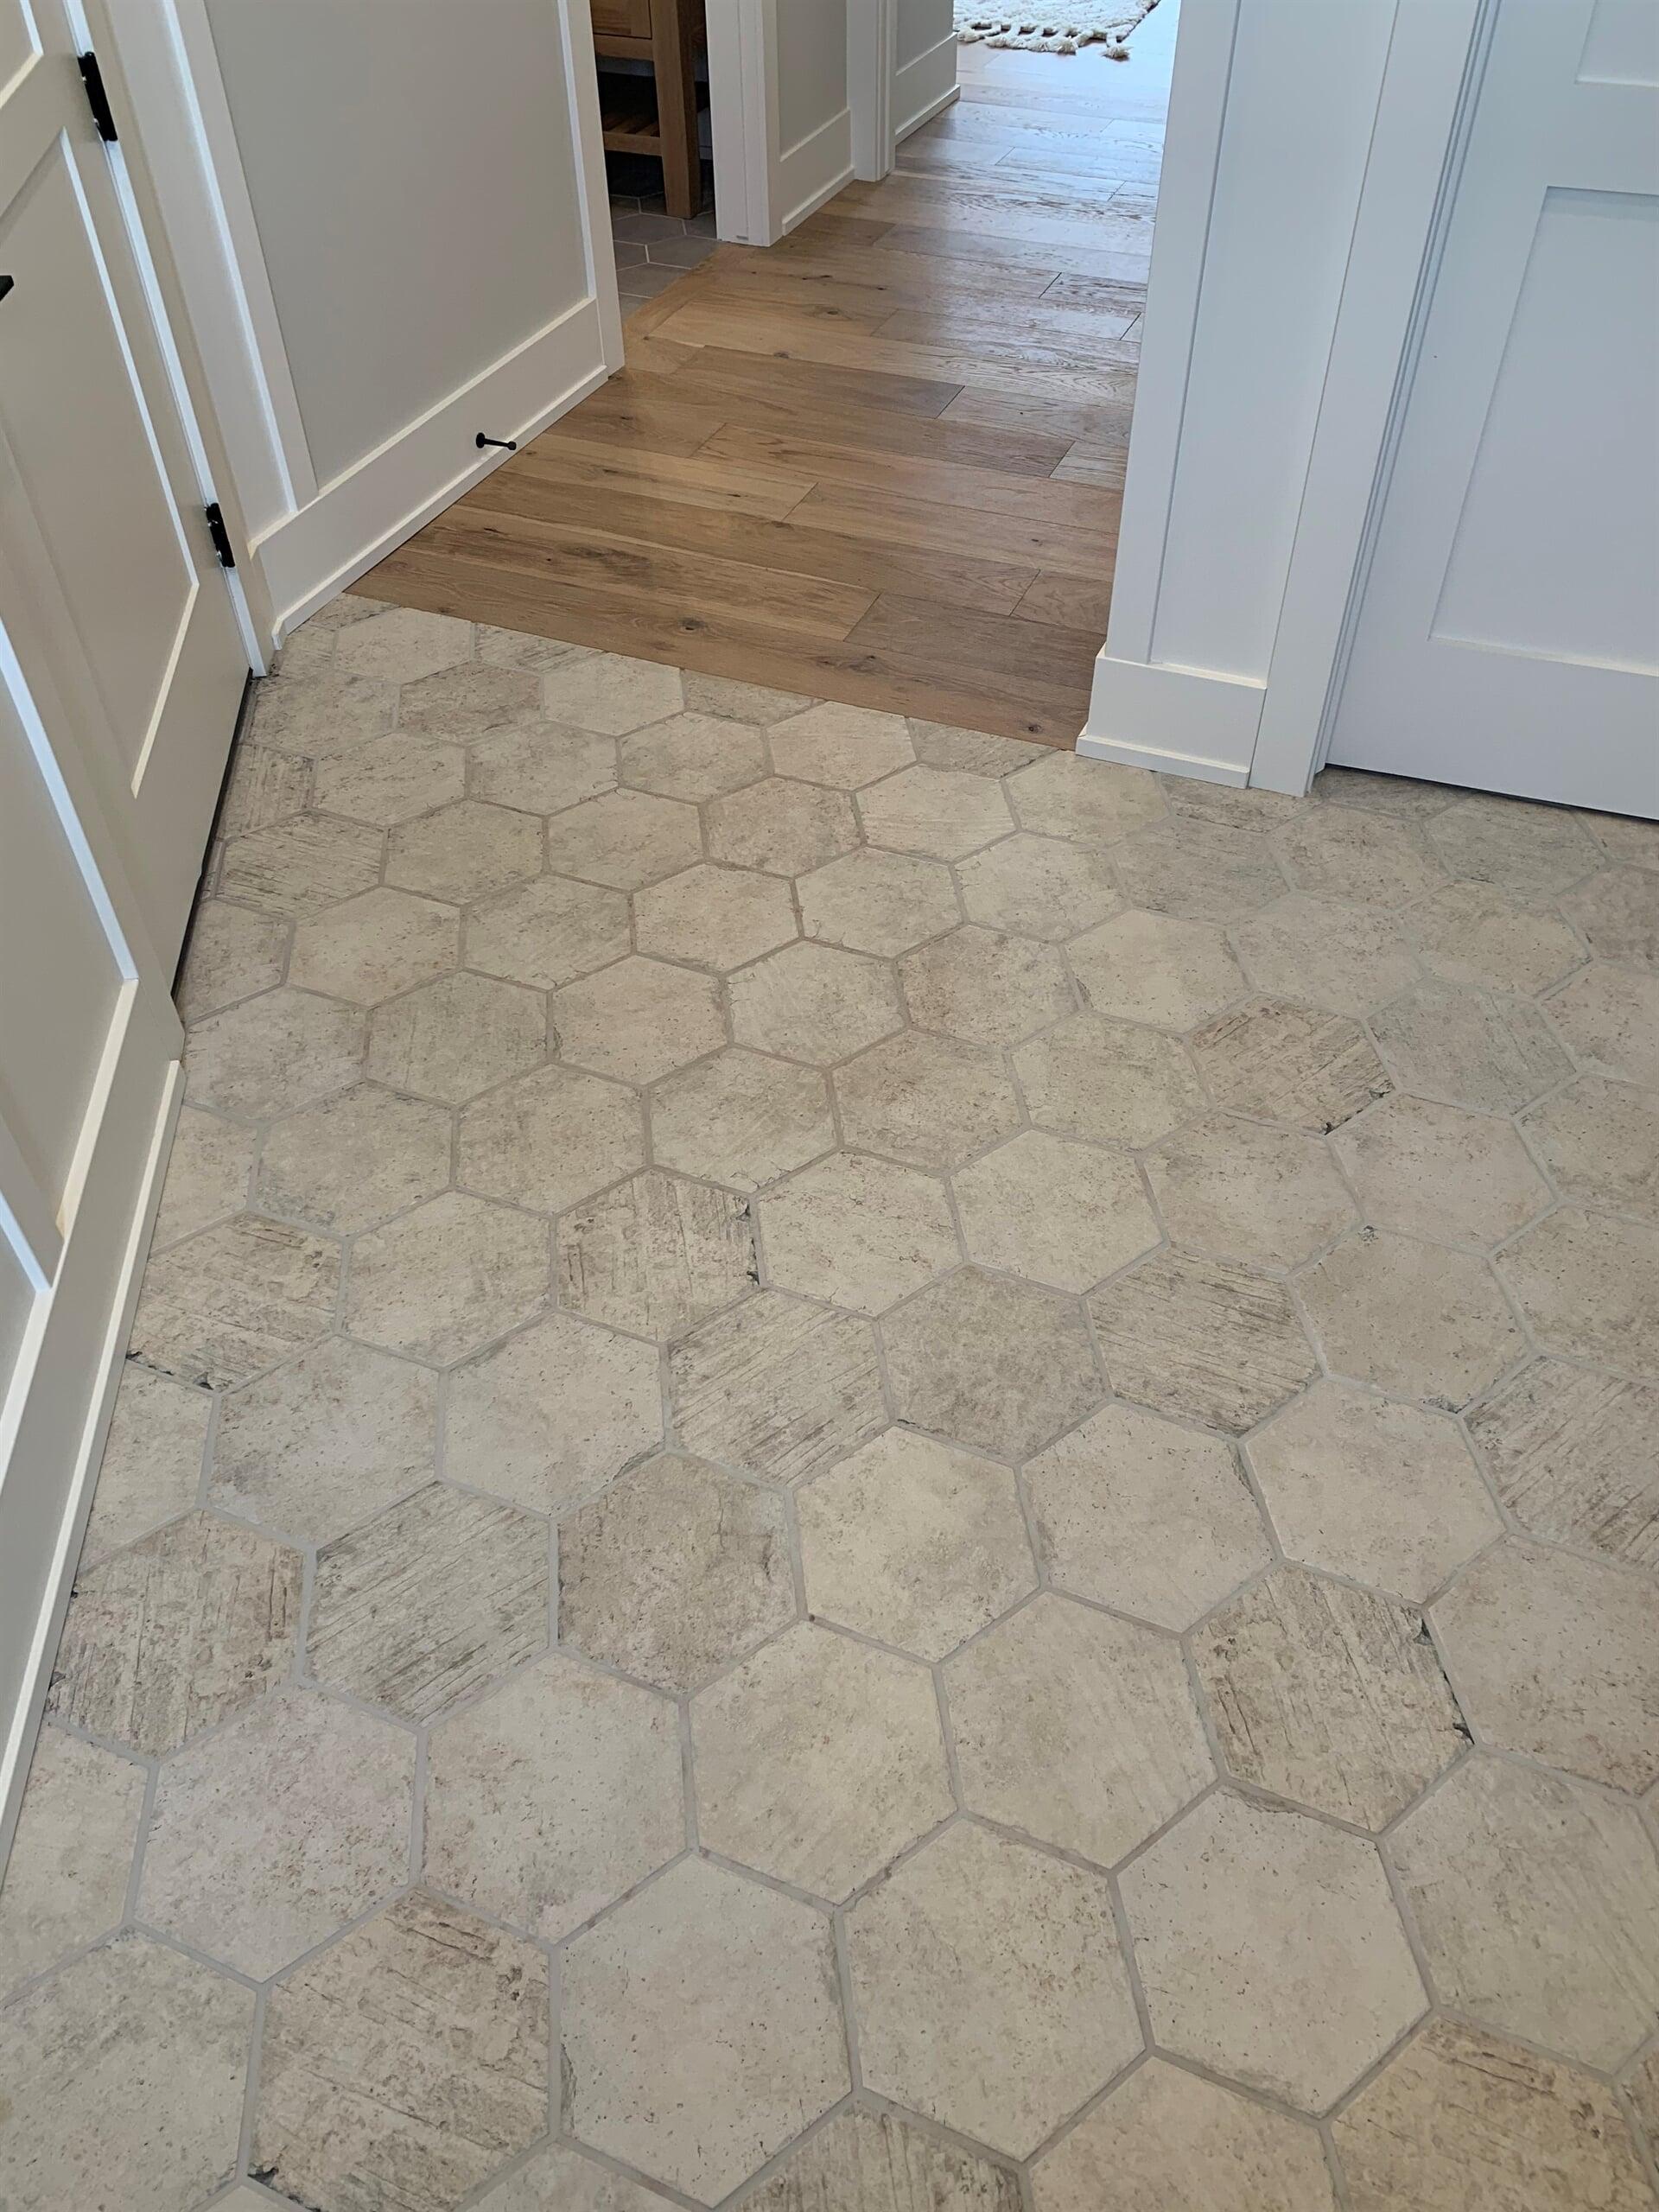 Tile flooring in Byron Center, MI from Village Custom Interiors